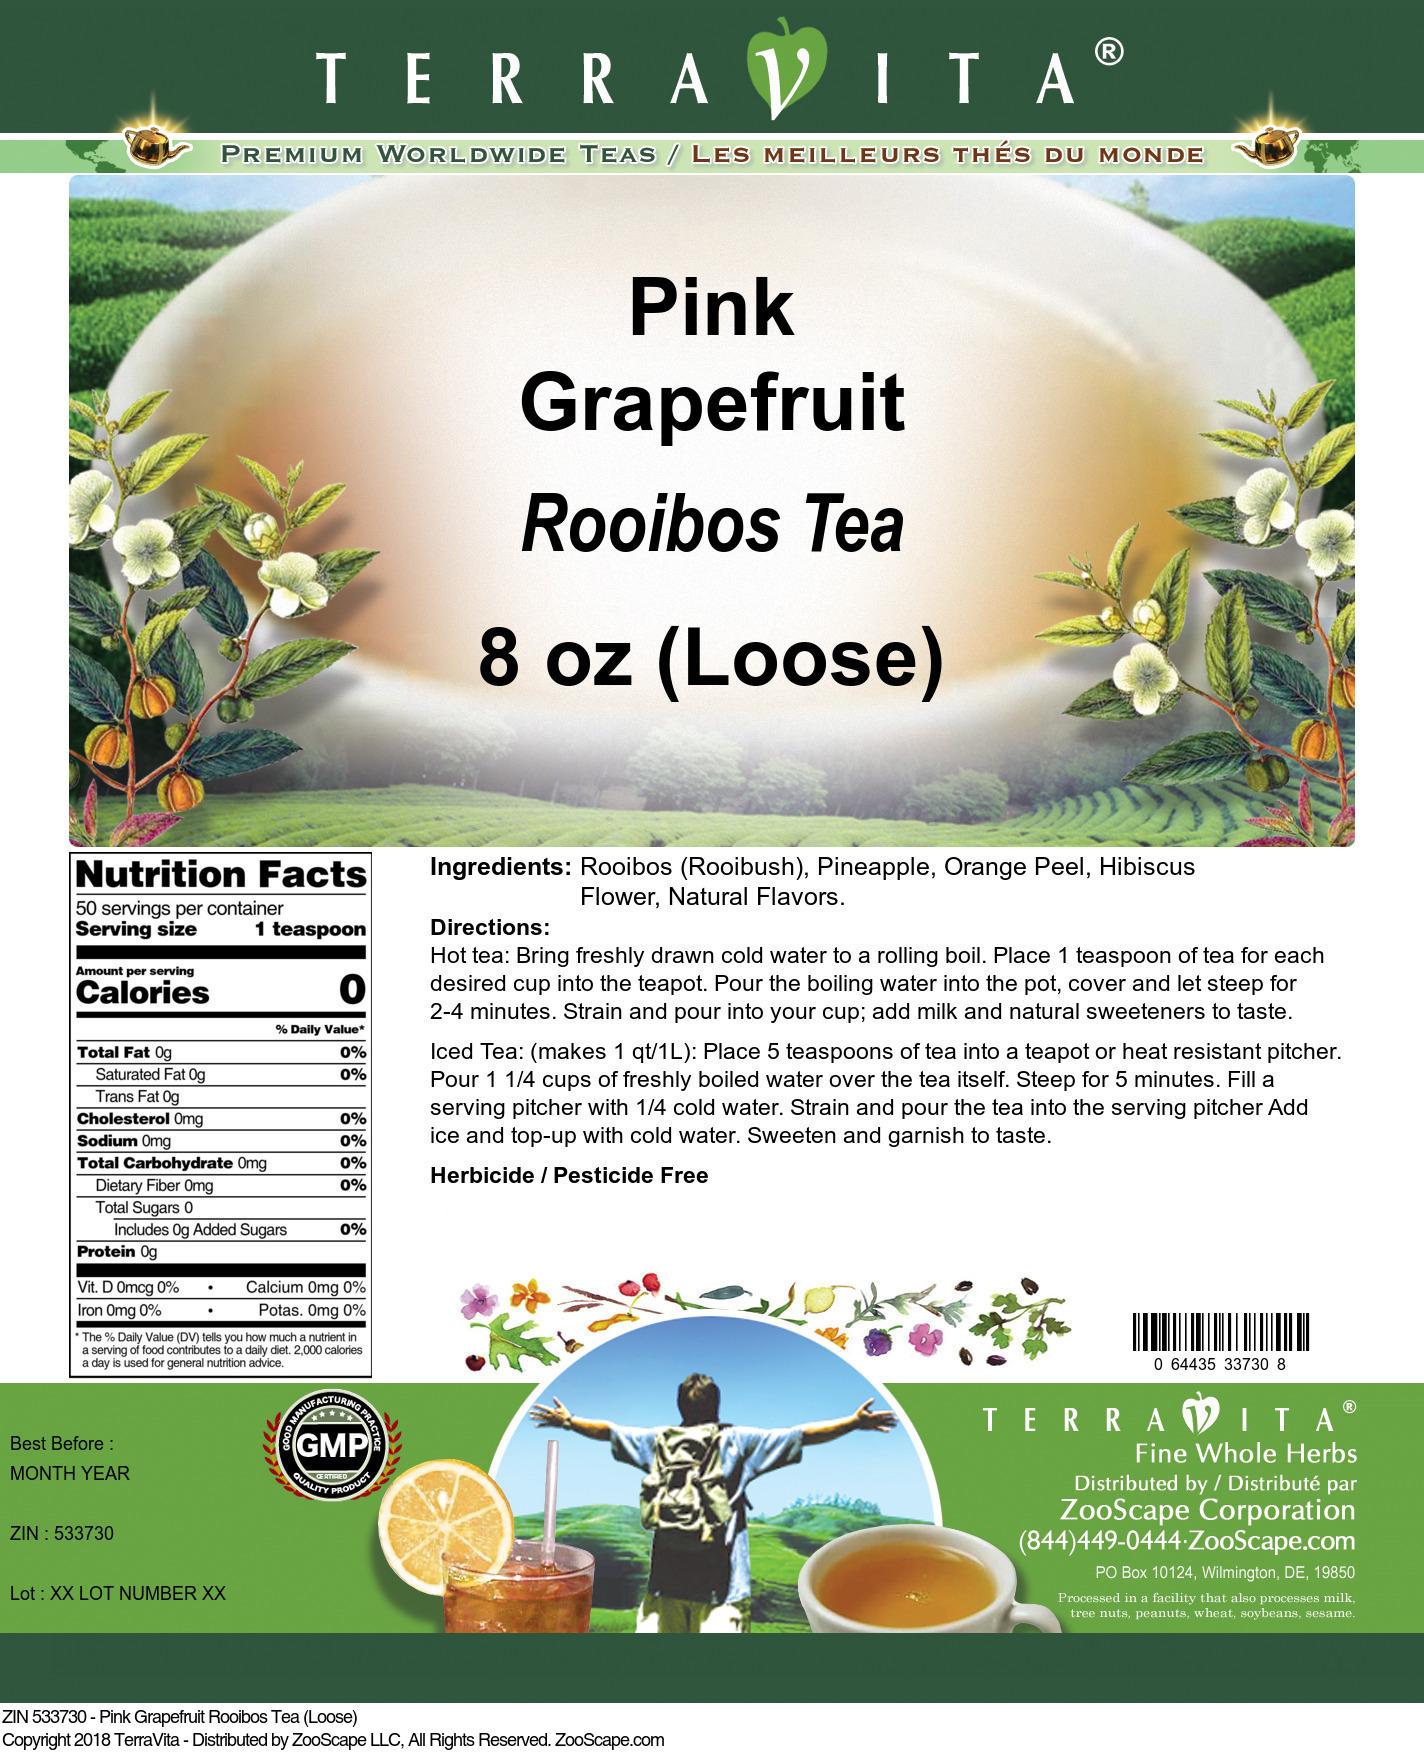 Pink Grapefruit Rooibos Tea (Loose)